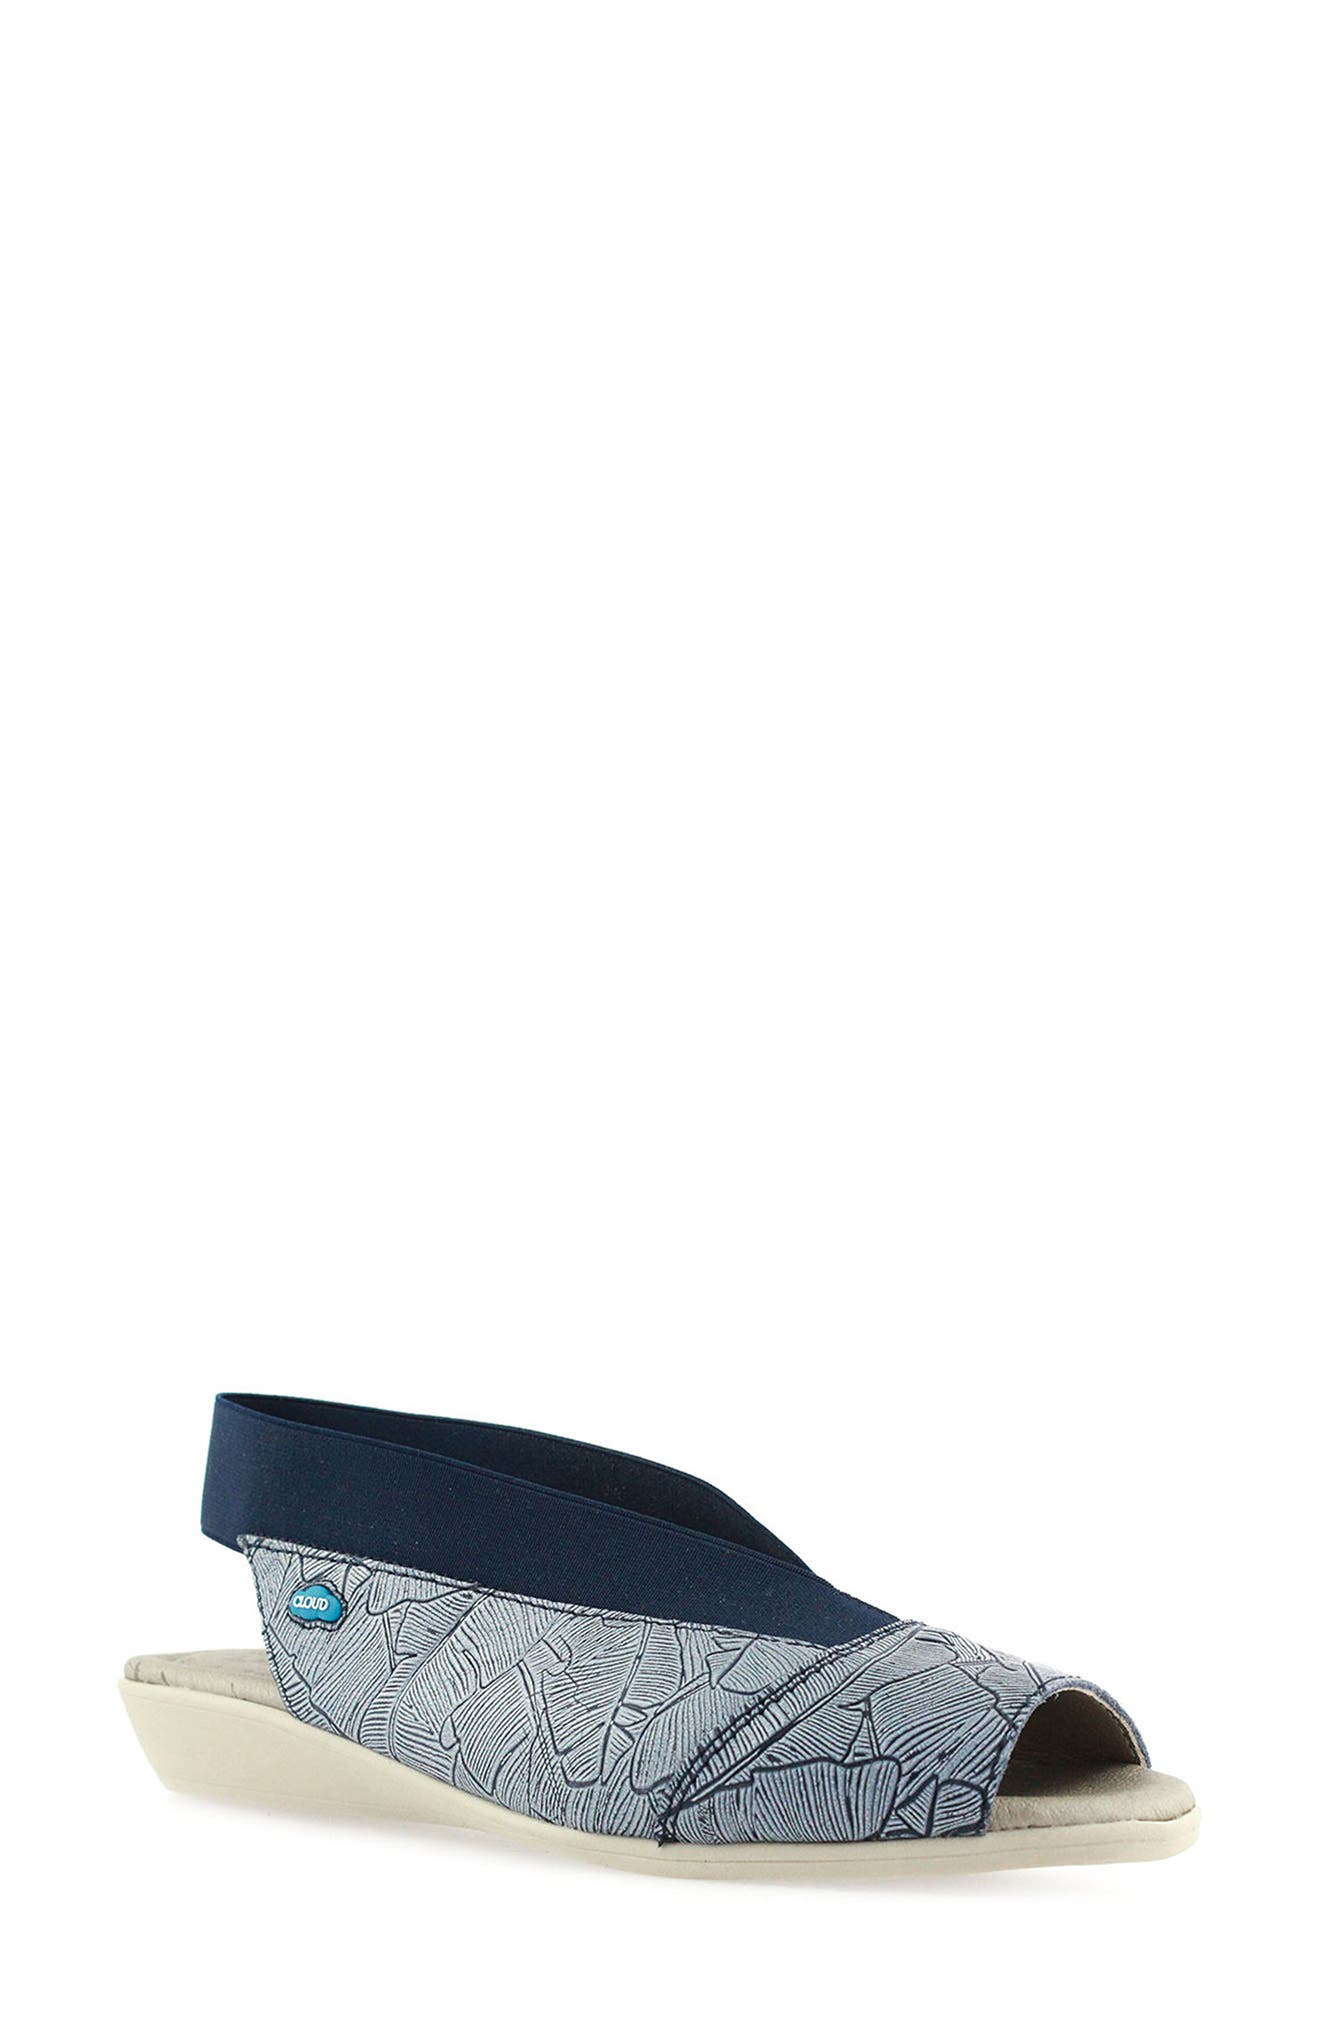 'Caliber' Peep Toe Leather Sandal